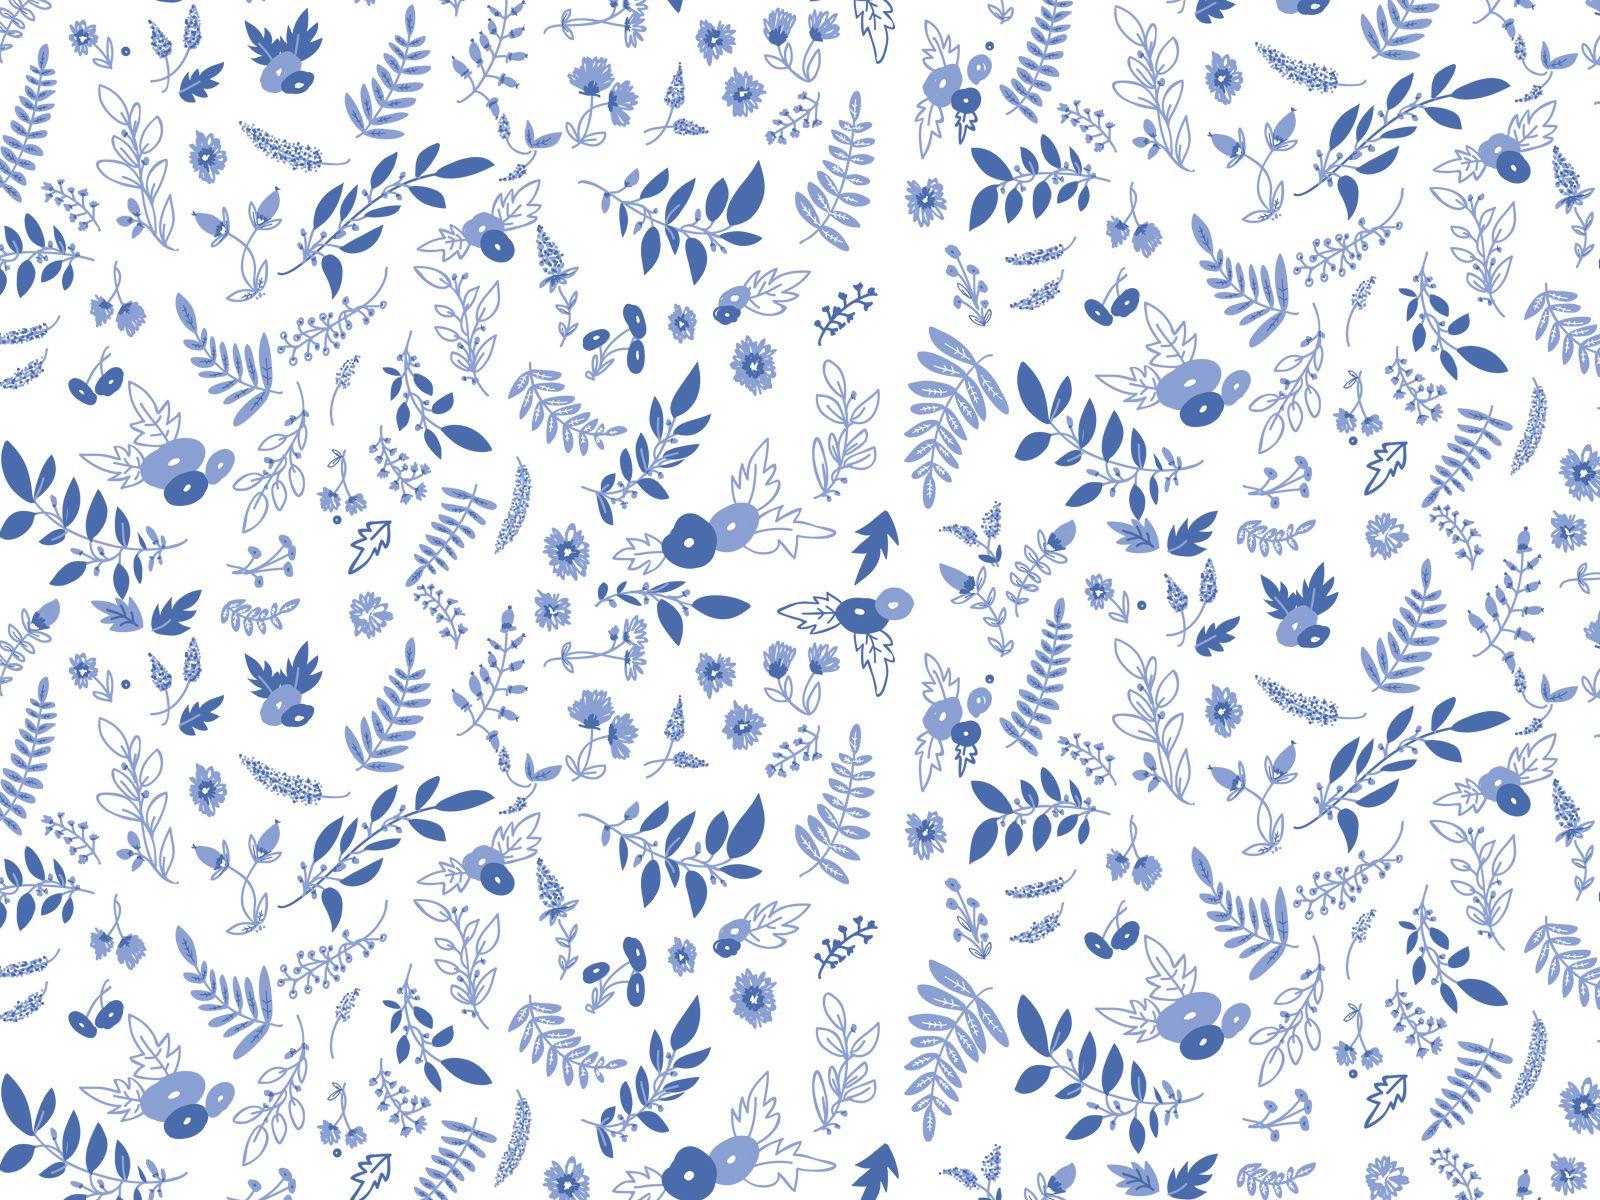 blue white floral botanical pattern desktop wallpaper